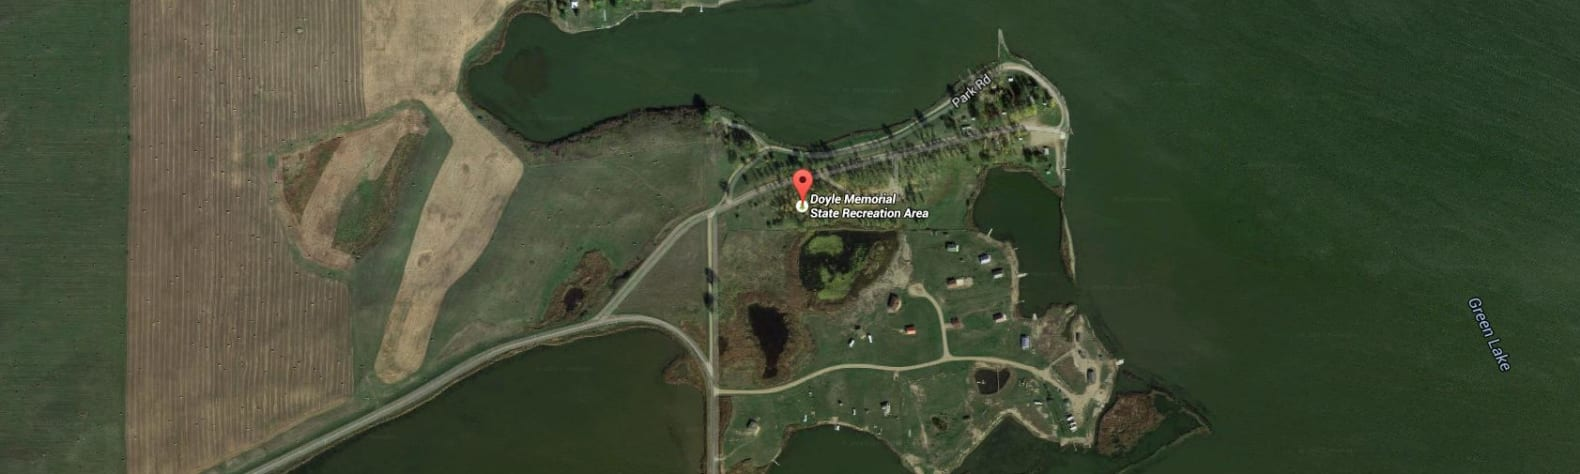 Doyle Memorial State Recreation Area